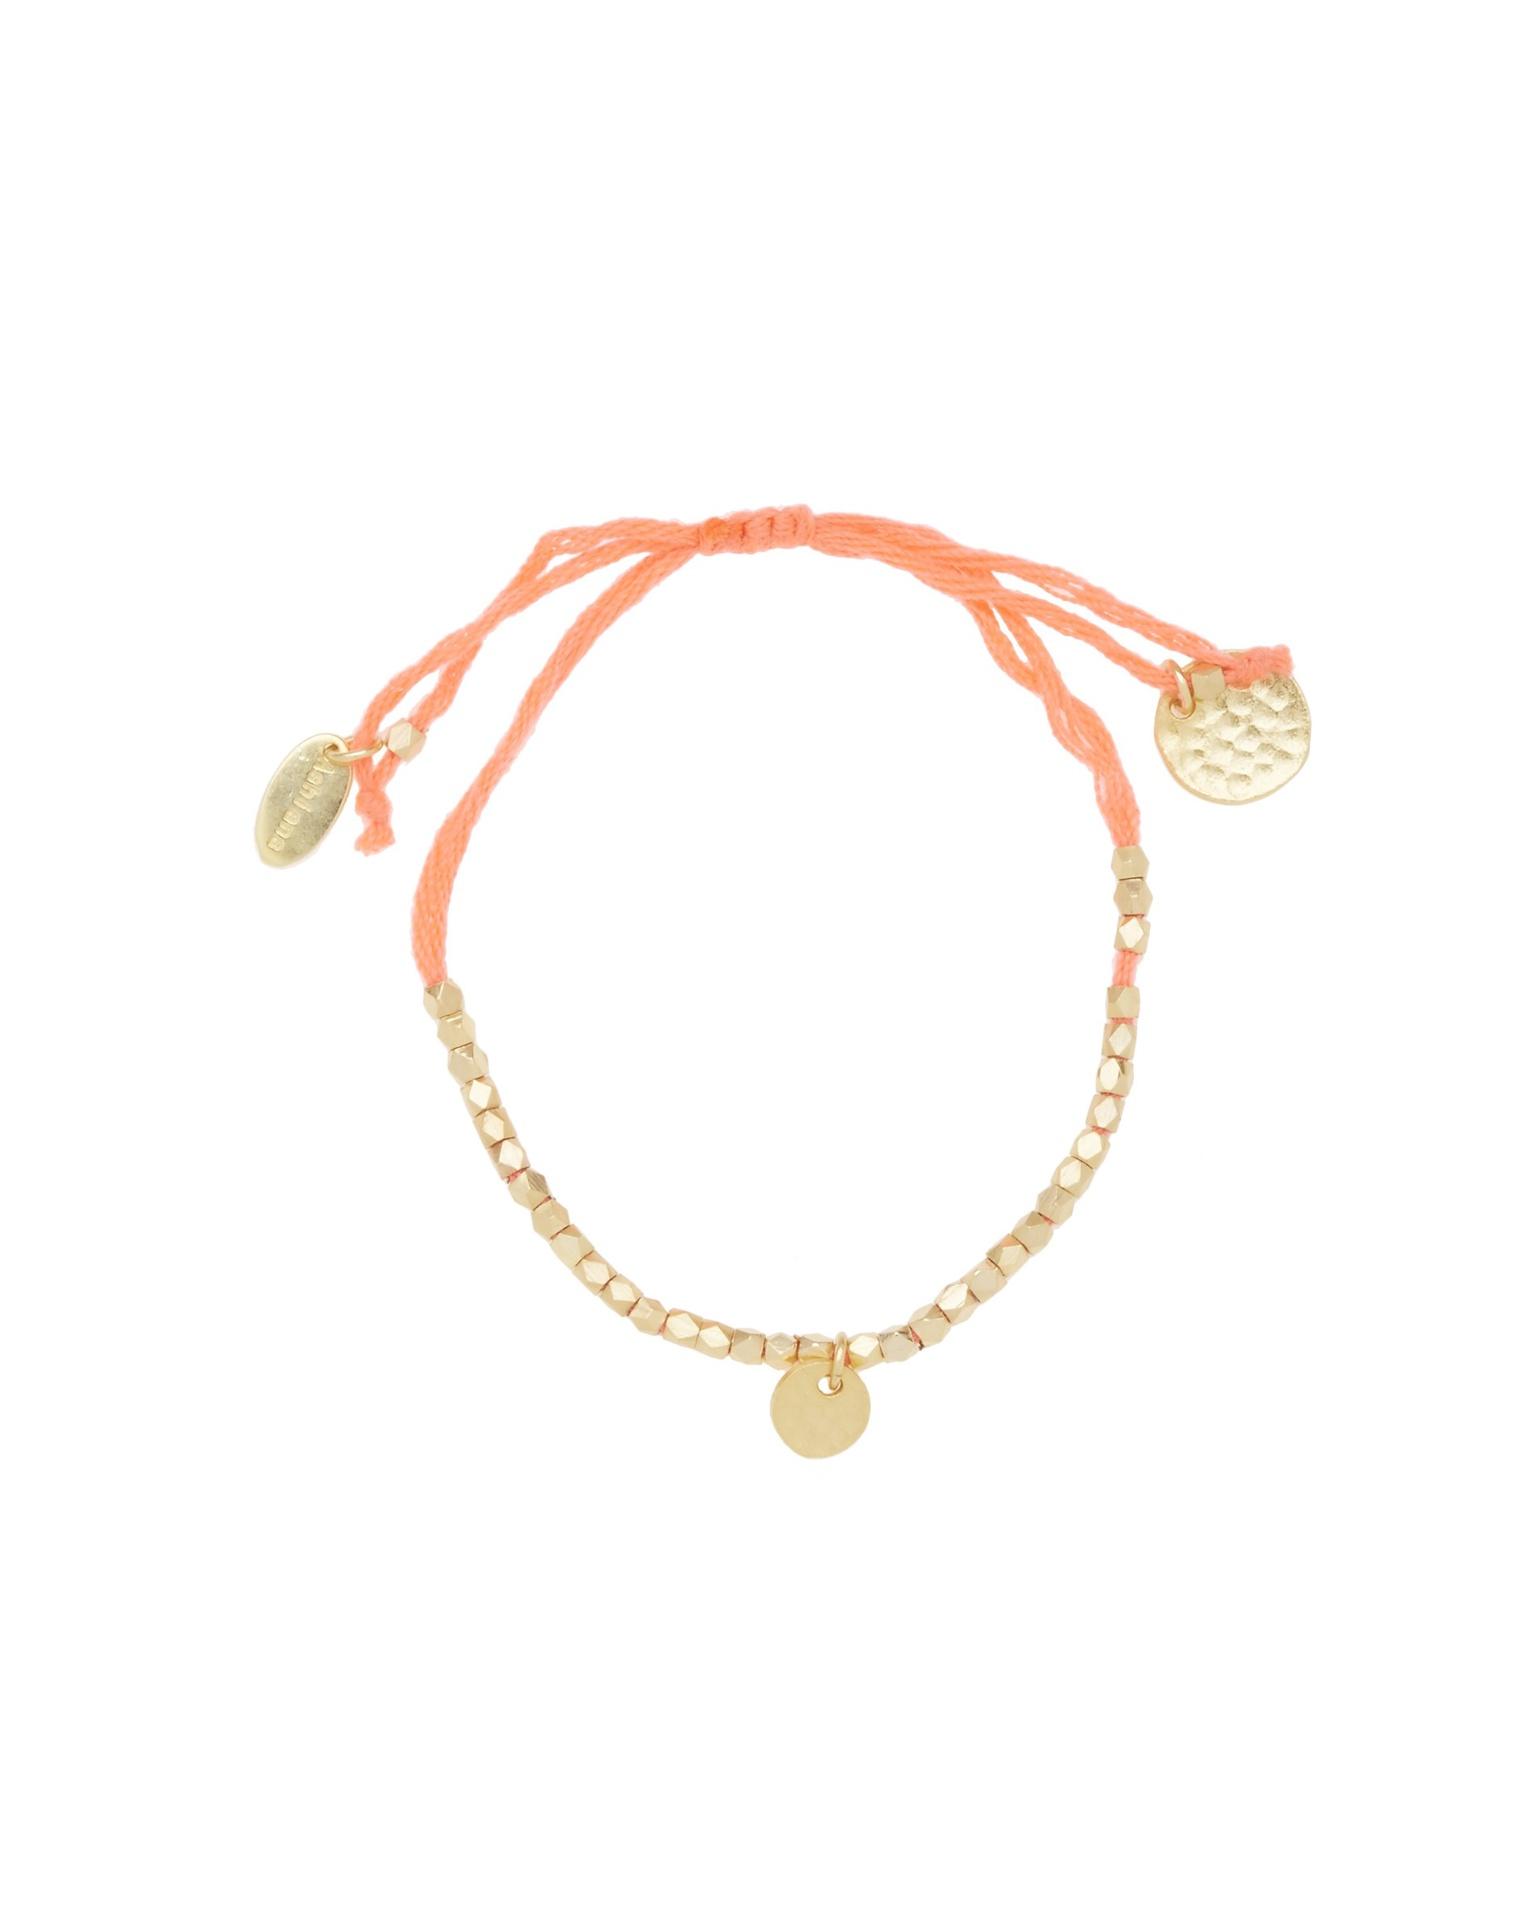 Mala Friendship bracelet with cord by Ashiana